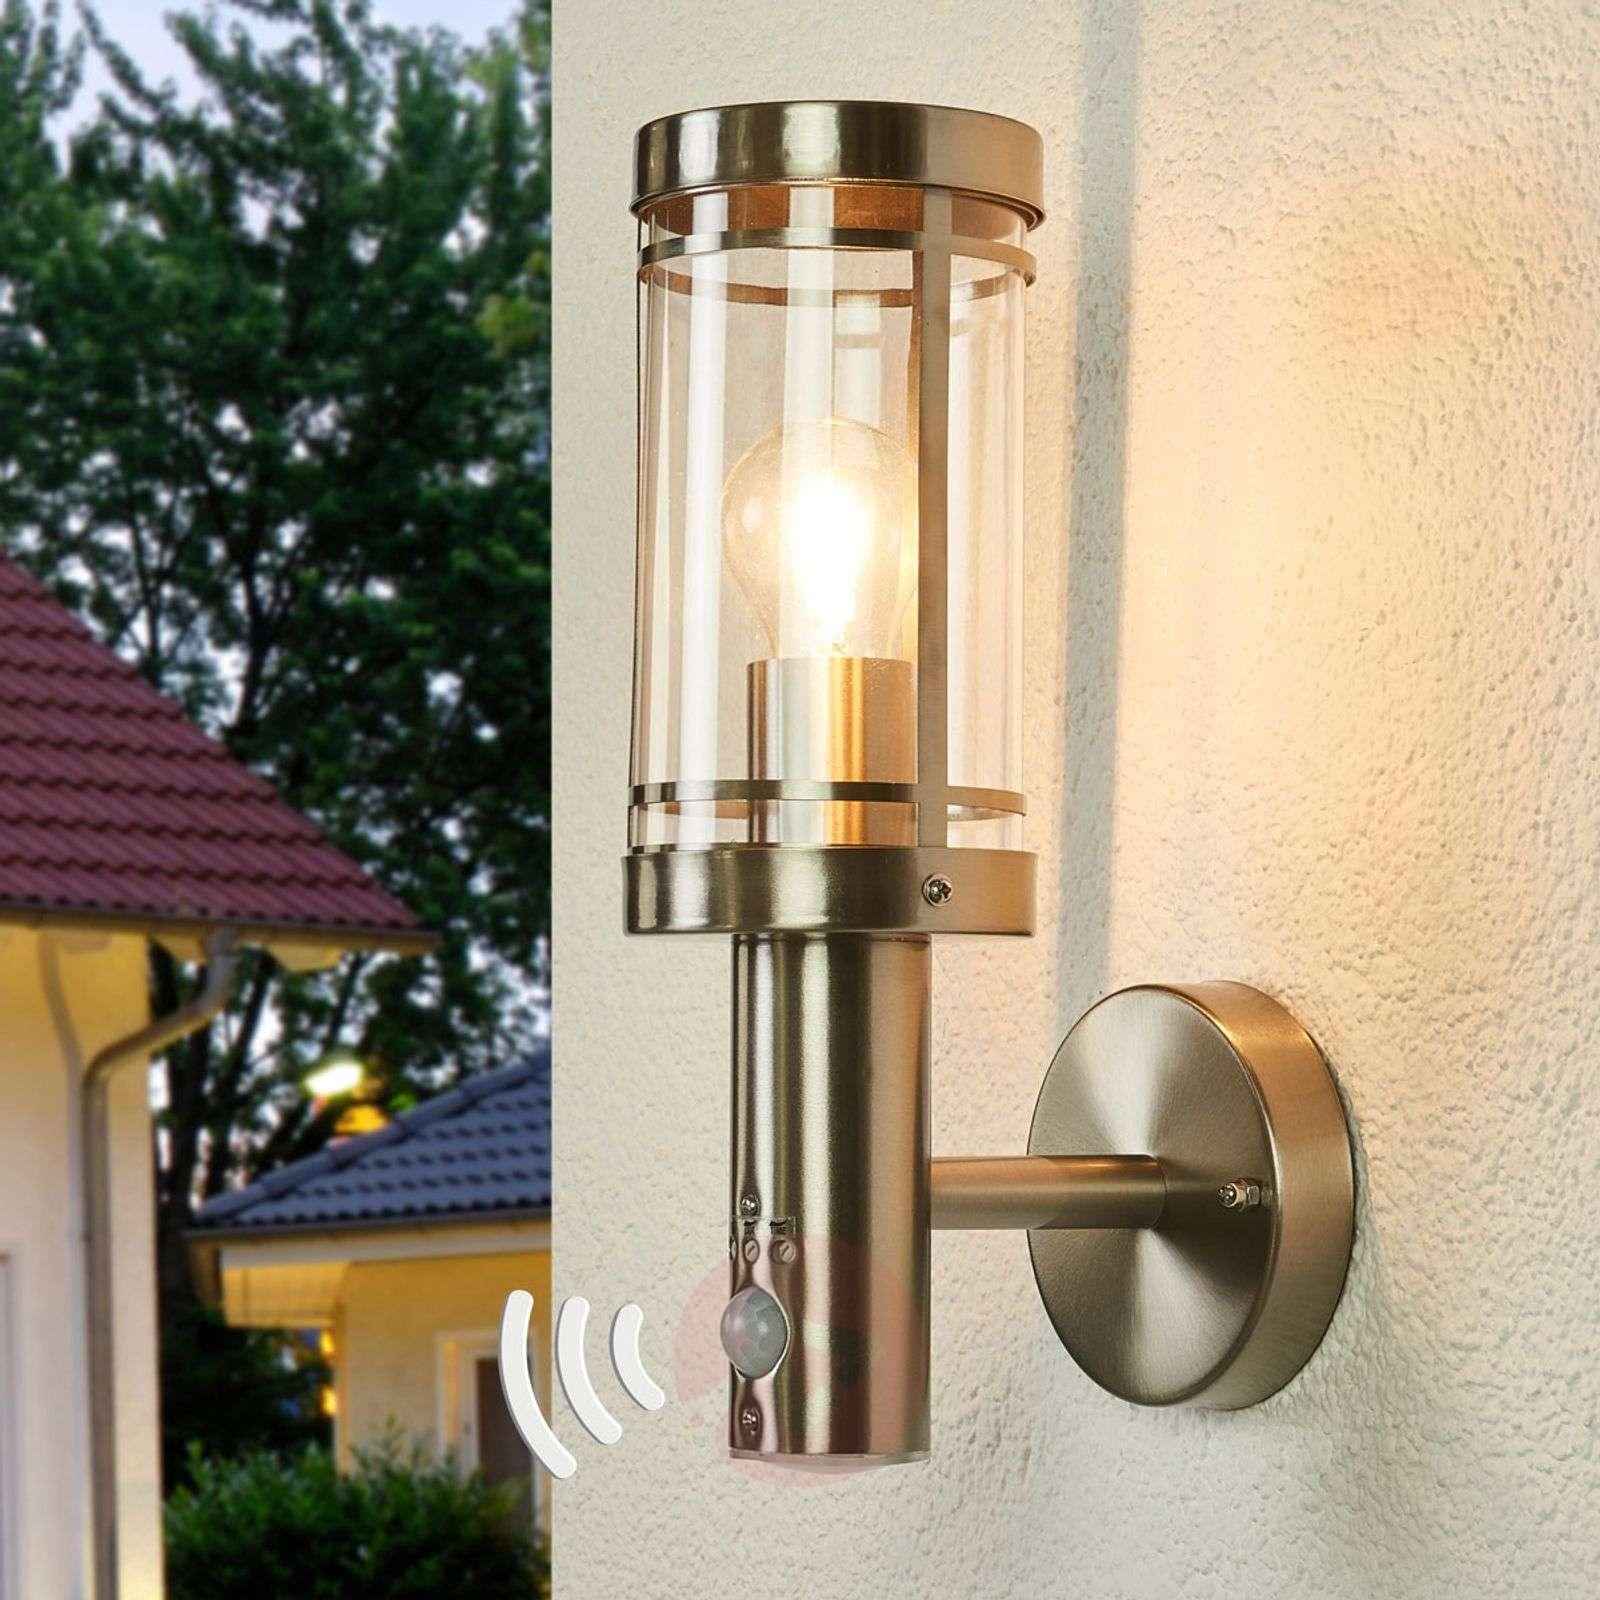 Sensor Stainless Steel Outdoor Wall Lamp Djori